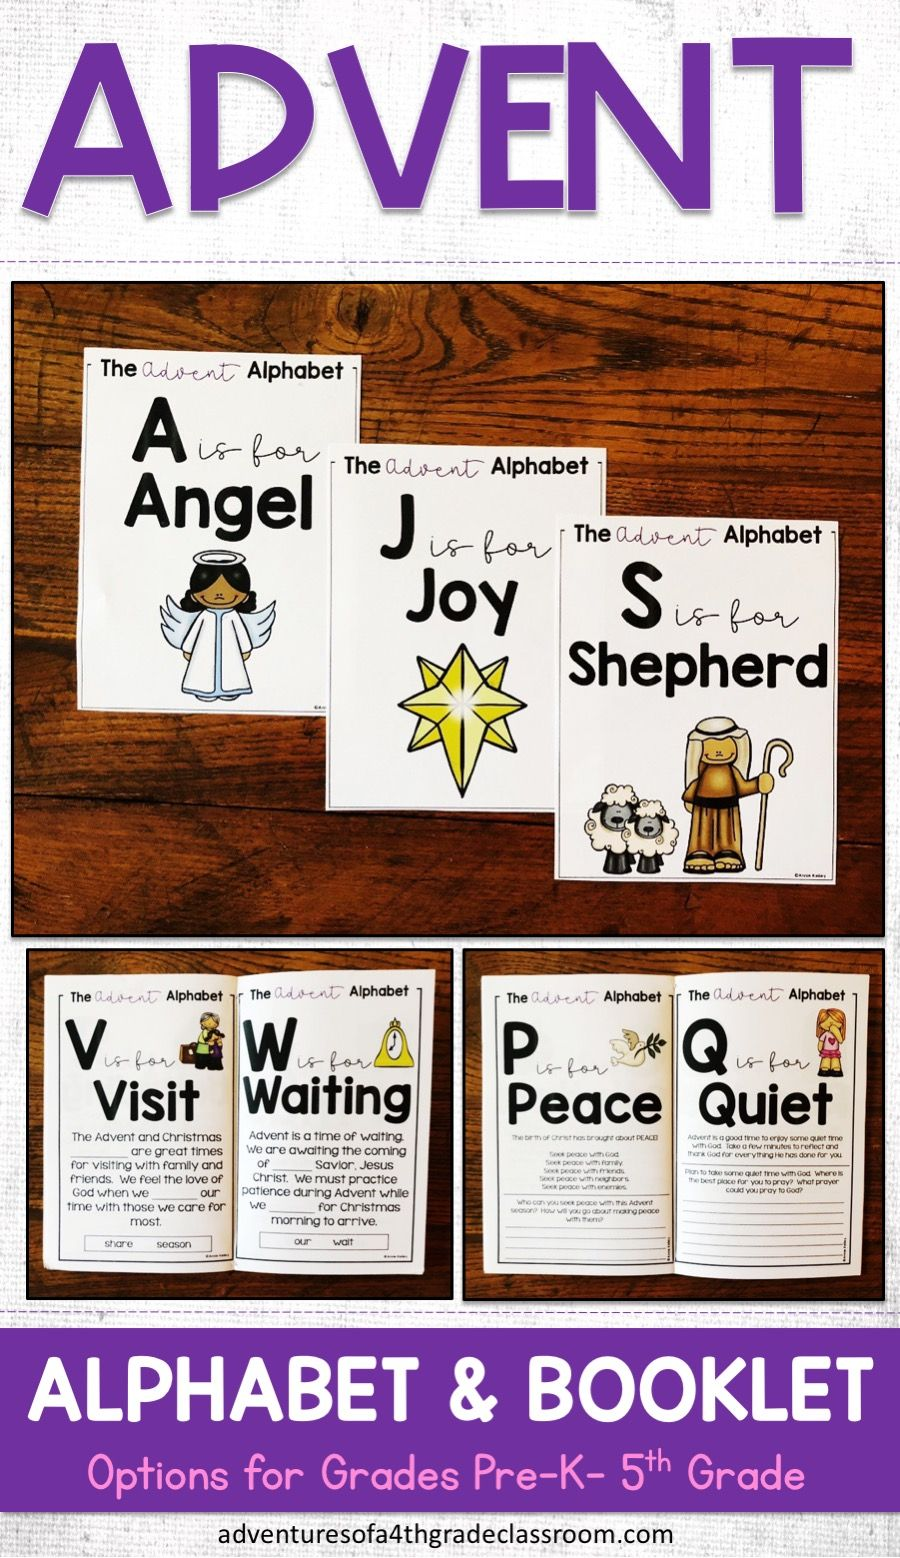 hight resolution of Advent Alphabet \u0026 Booklet   Elementary social studies lessons